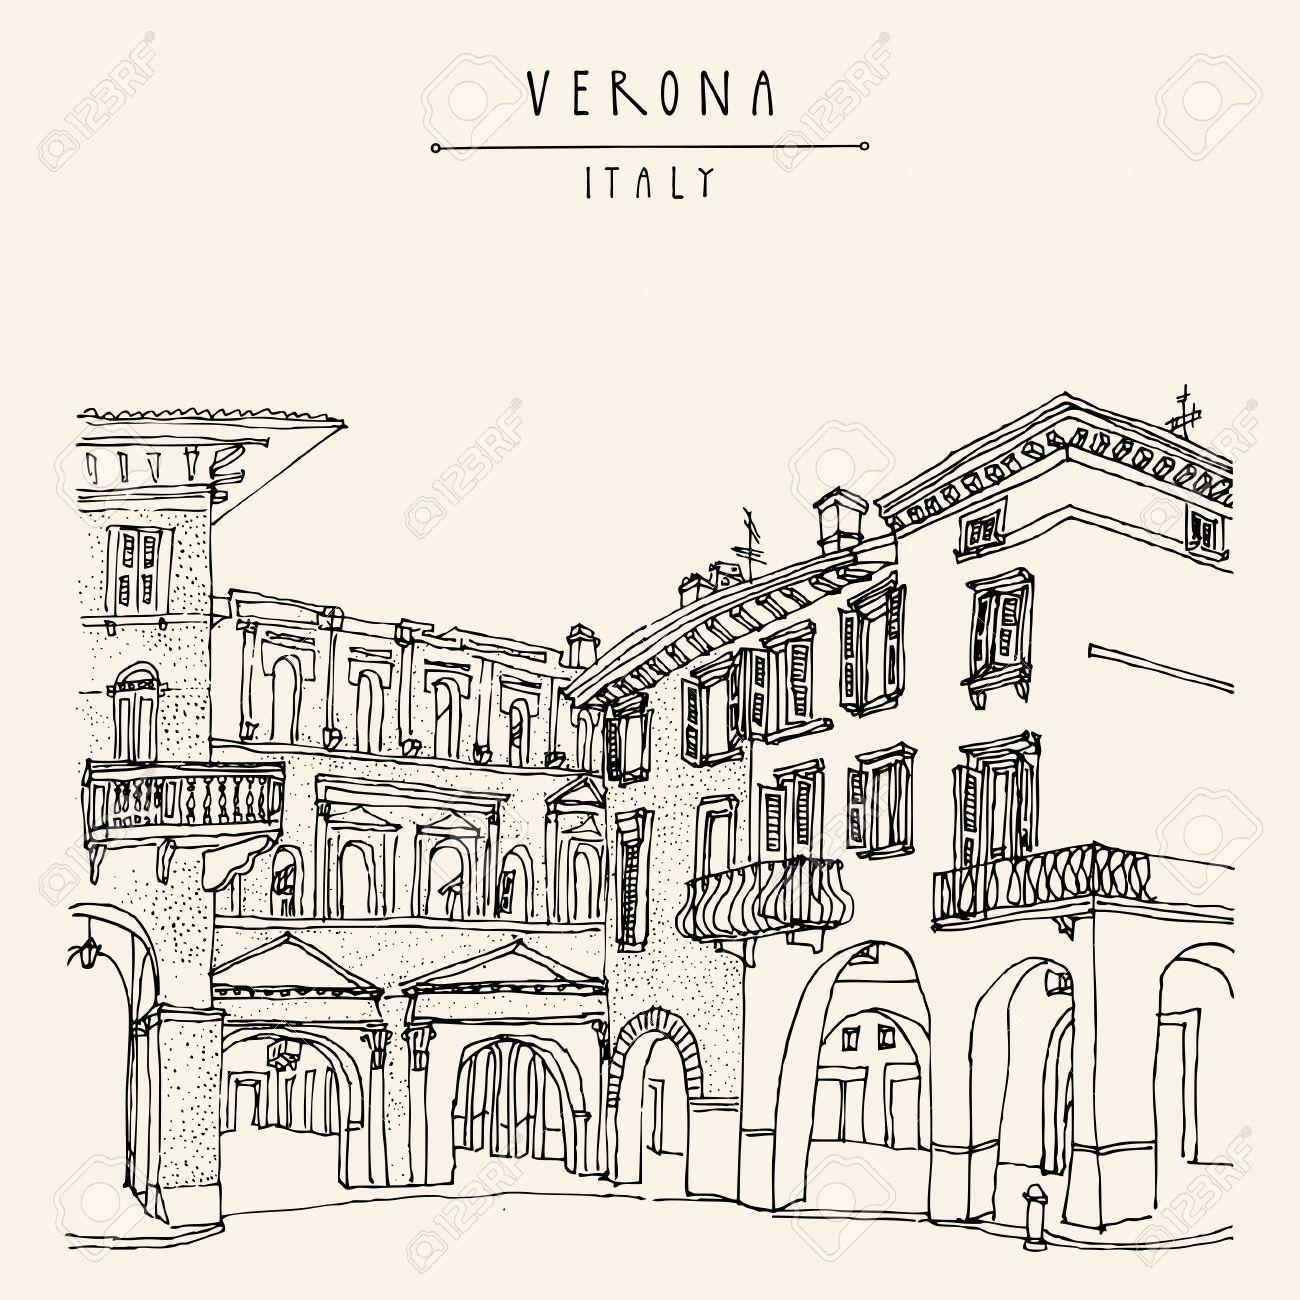 Verona, romantic Italian city of Romeo and Juliette. Old historic buildings. Travel sketch. Vector vintage hand drawn touristic postcard - 63467531